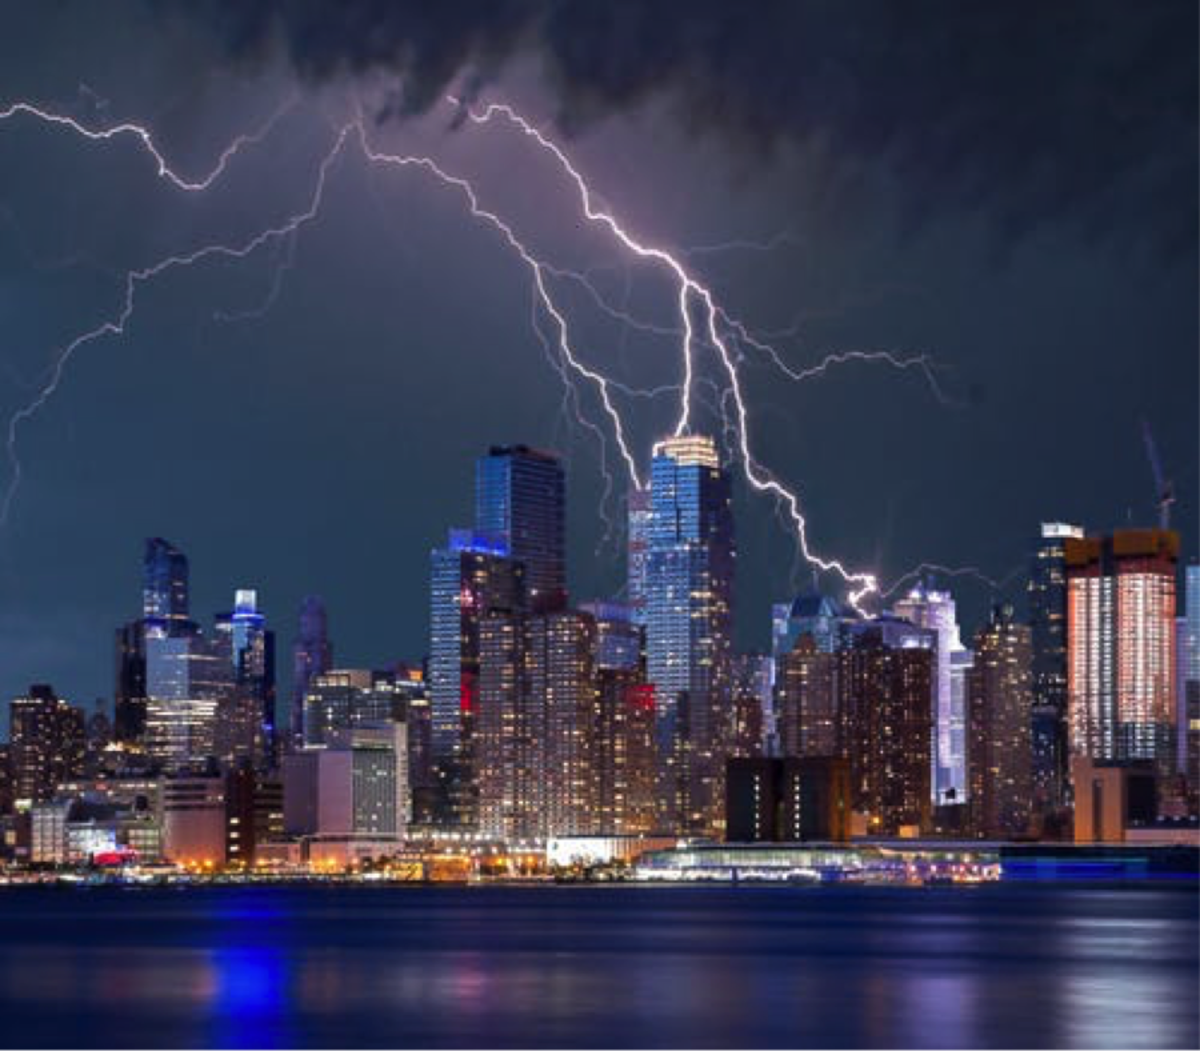 Lightning Rod on Top of Building